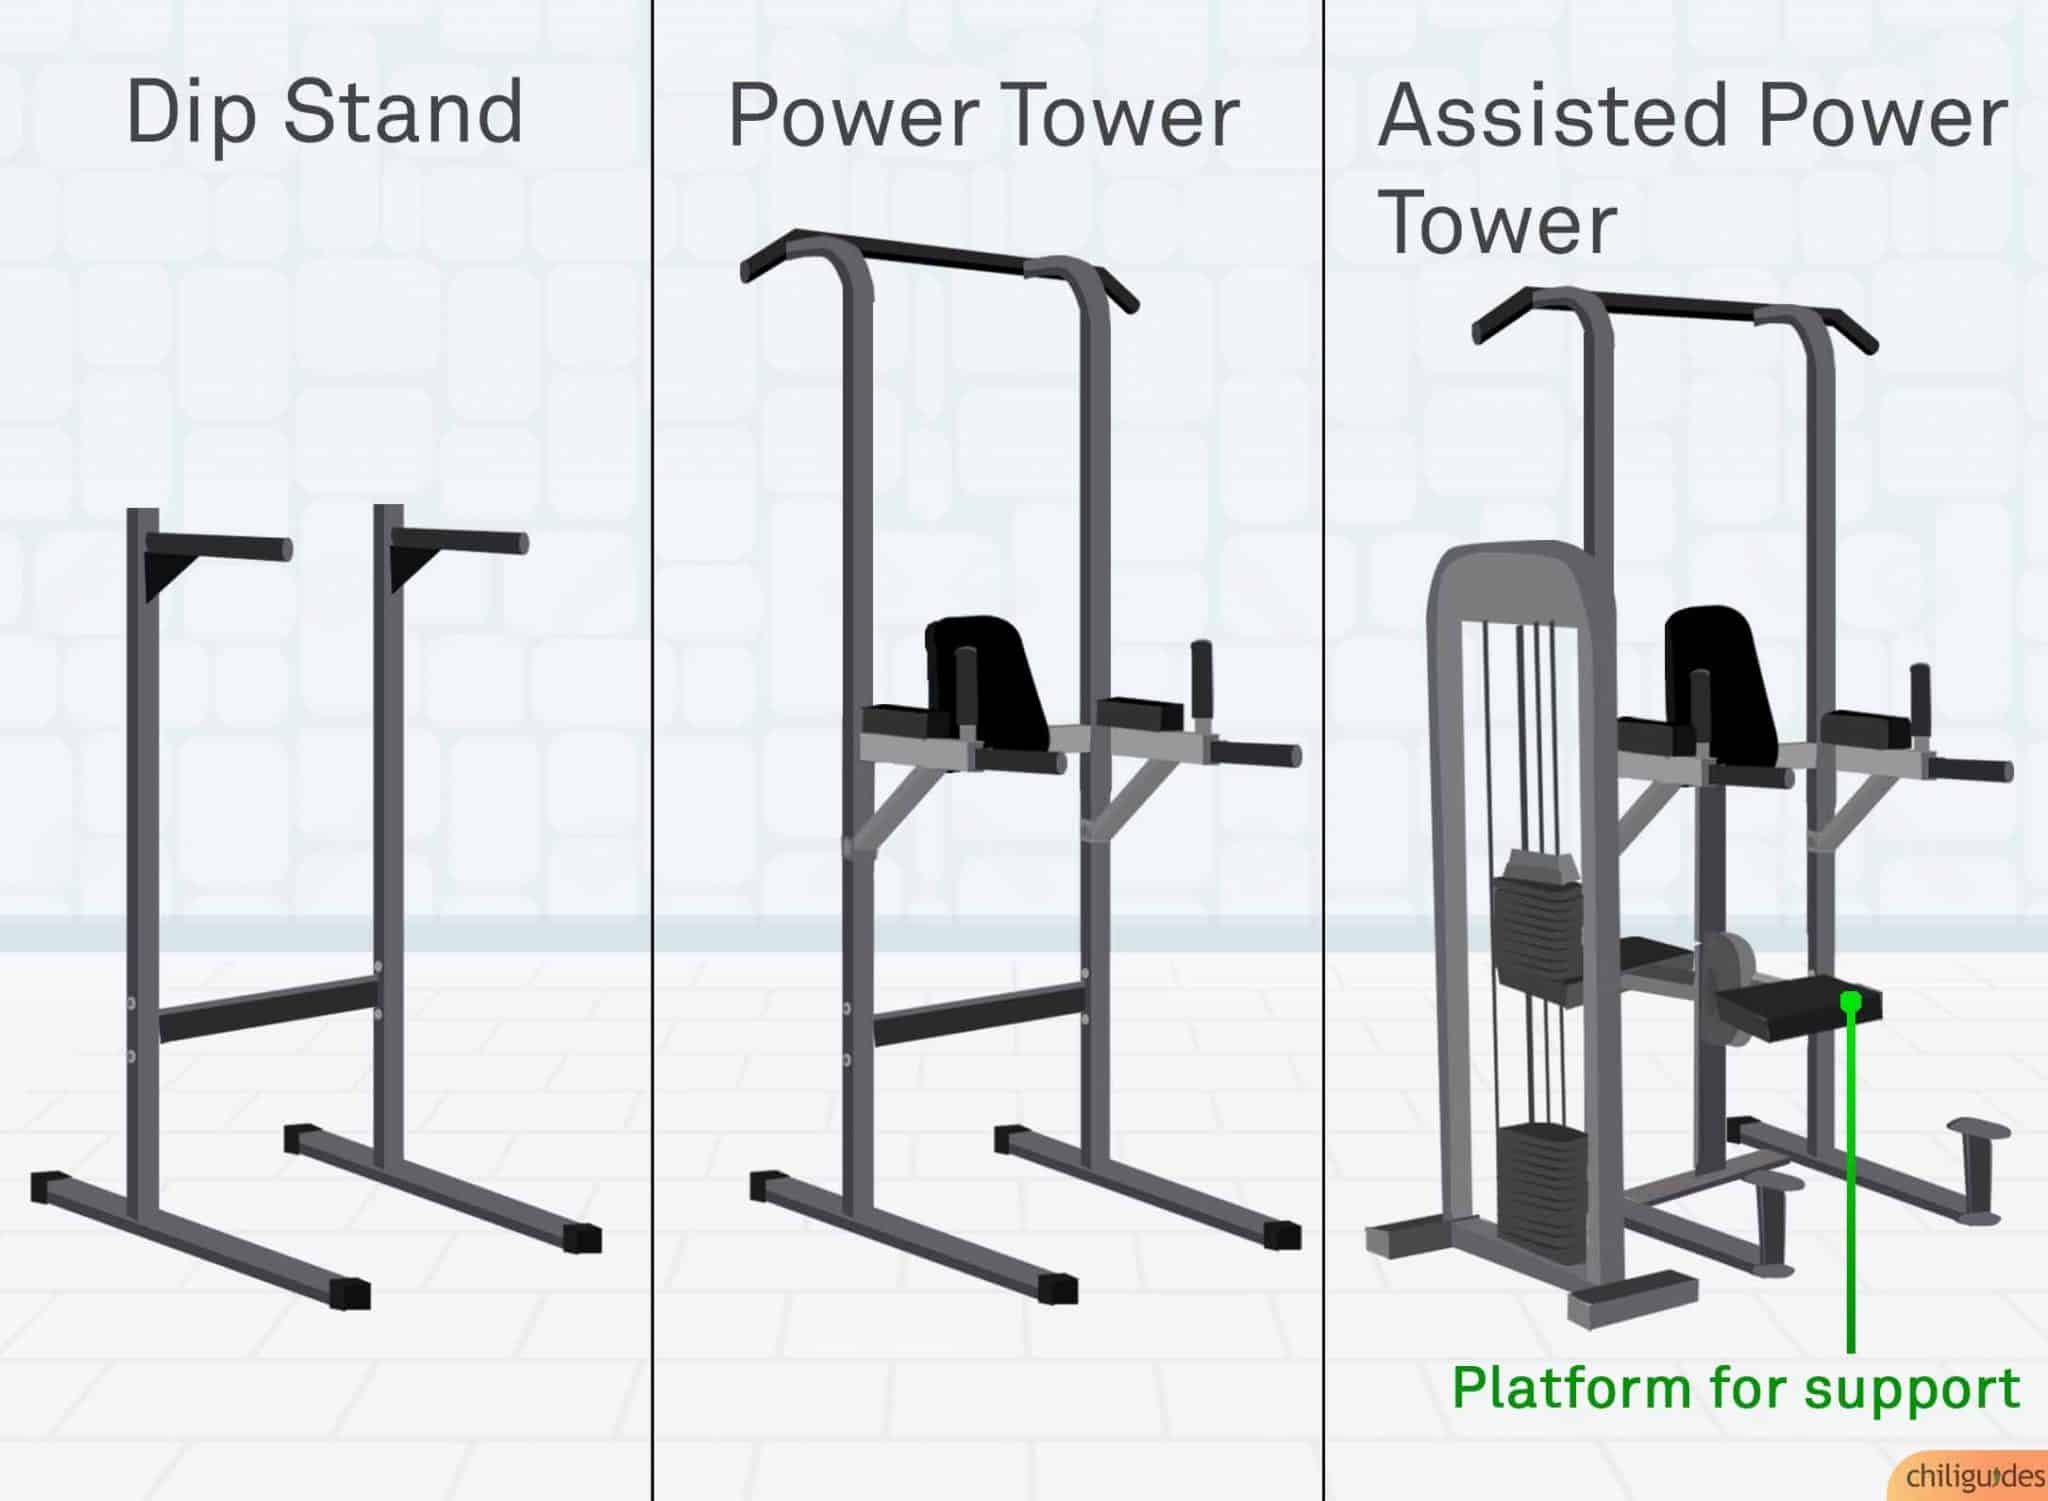 <p><b>Regular vs. Power Tower vs. Assisted </b></p>